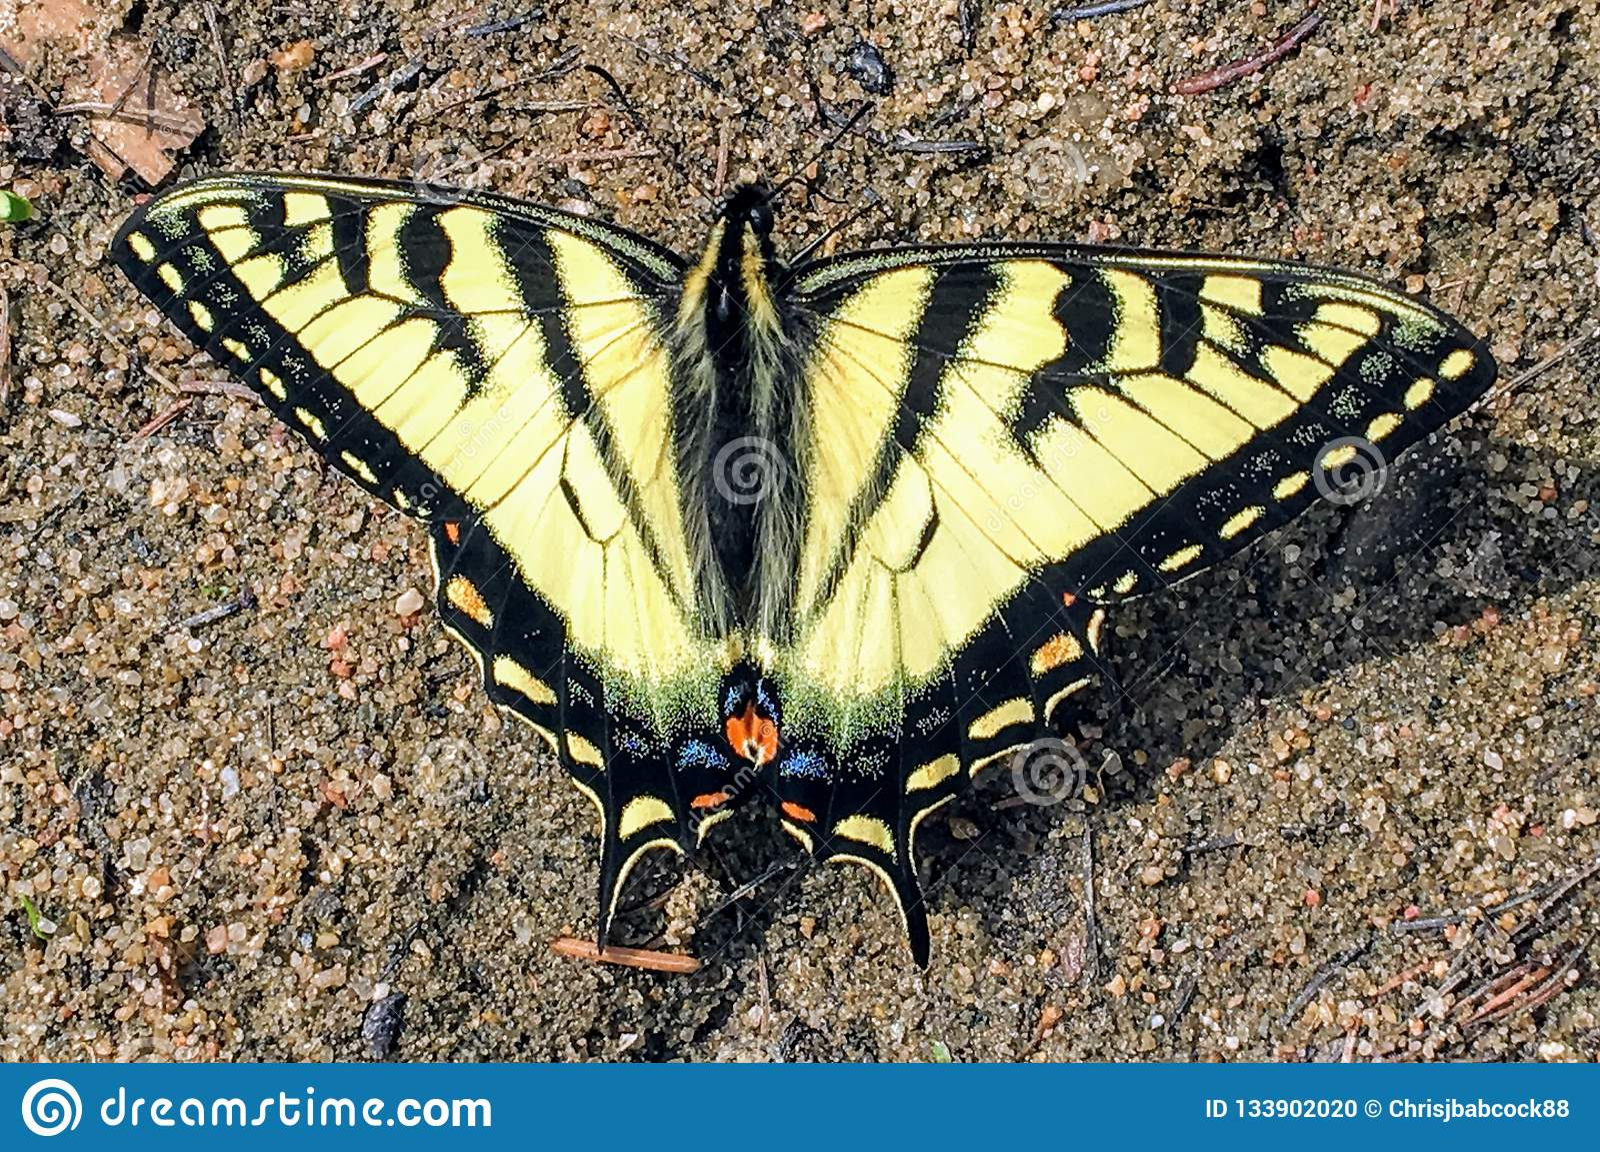 A beautiful Canadian Tiger Swallowtail, seen in Northern Alberta, Canada.